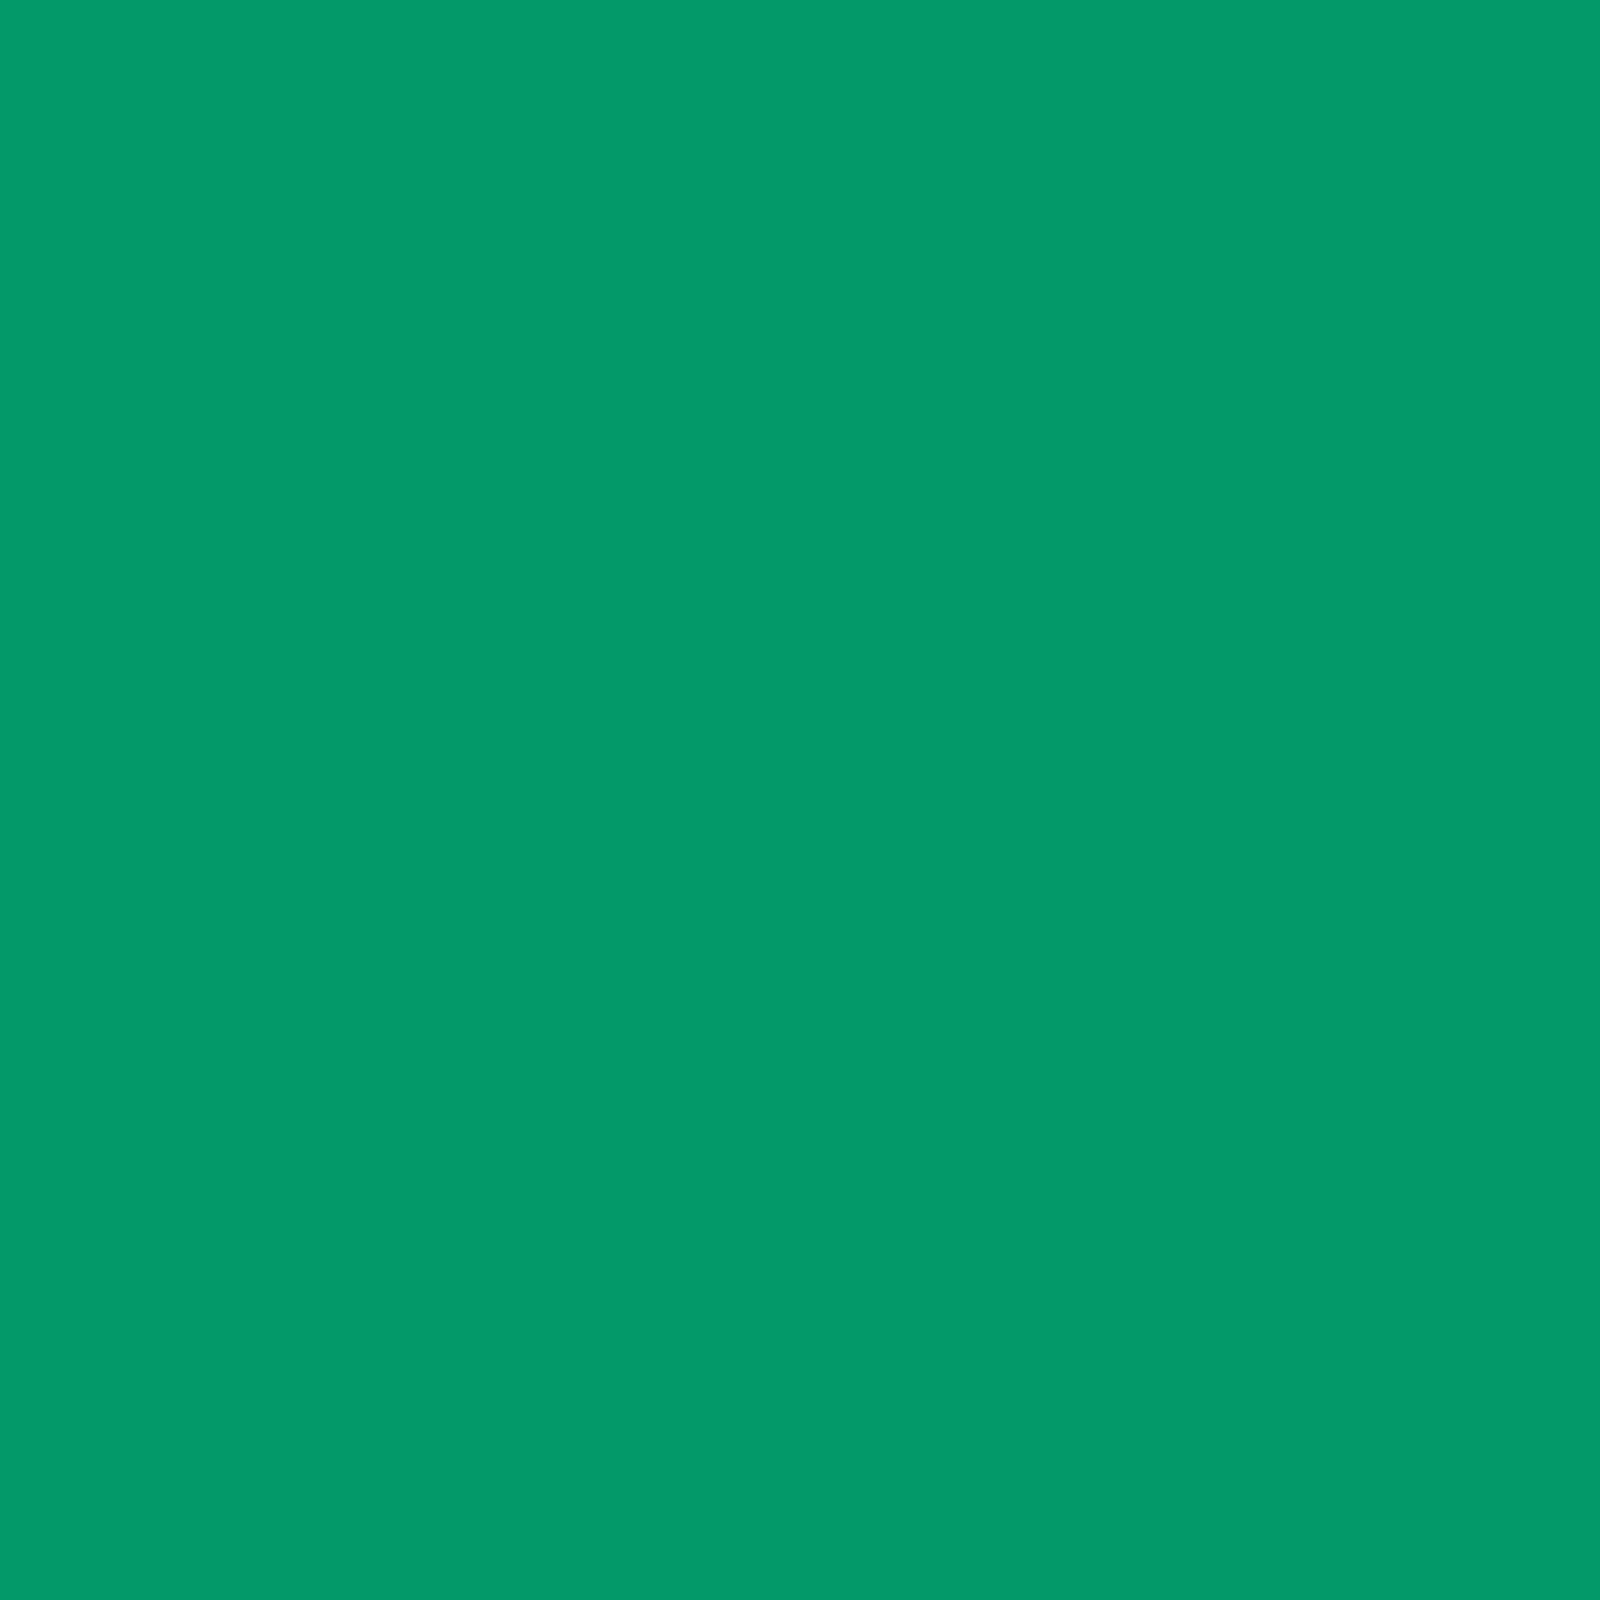 kobra verde arc